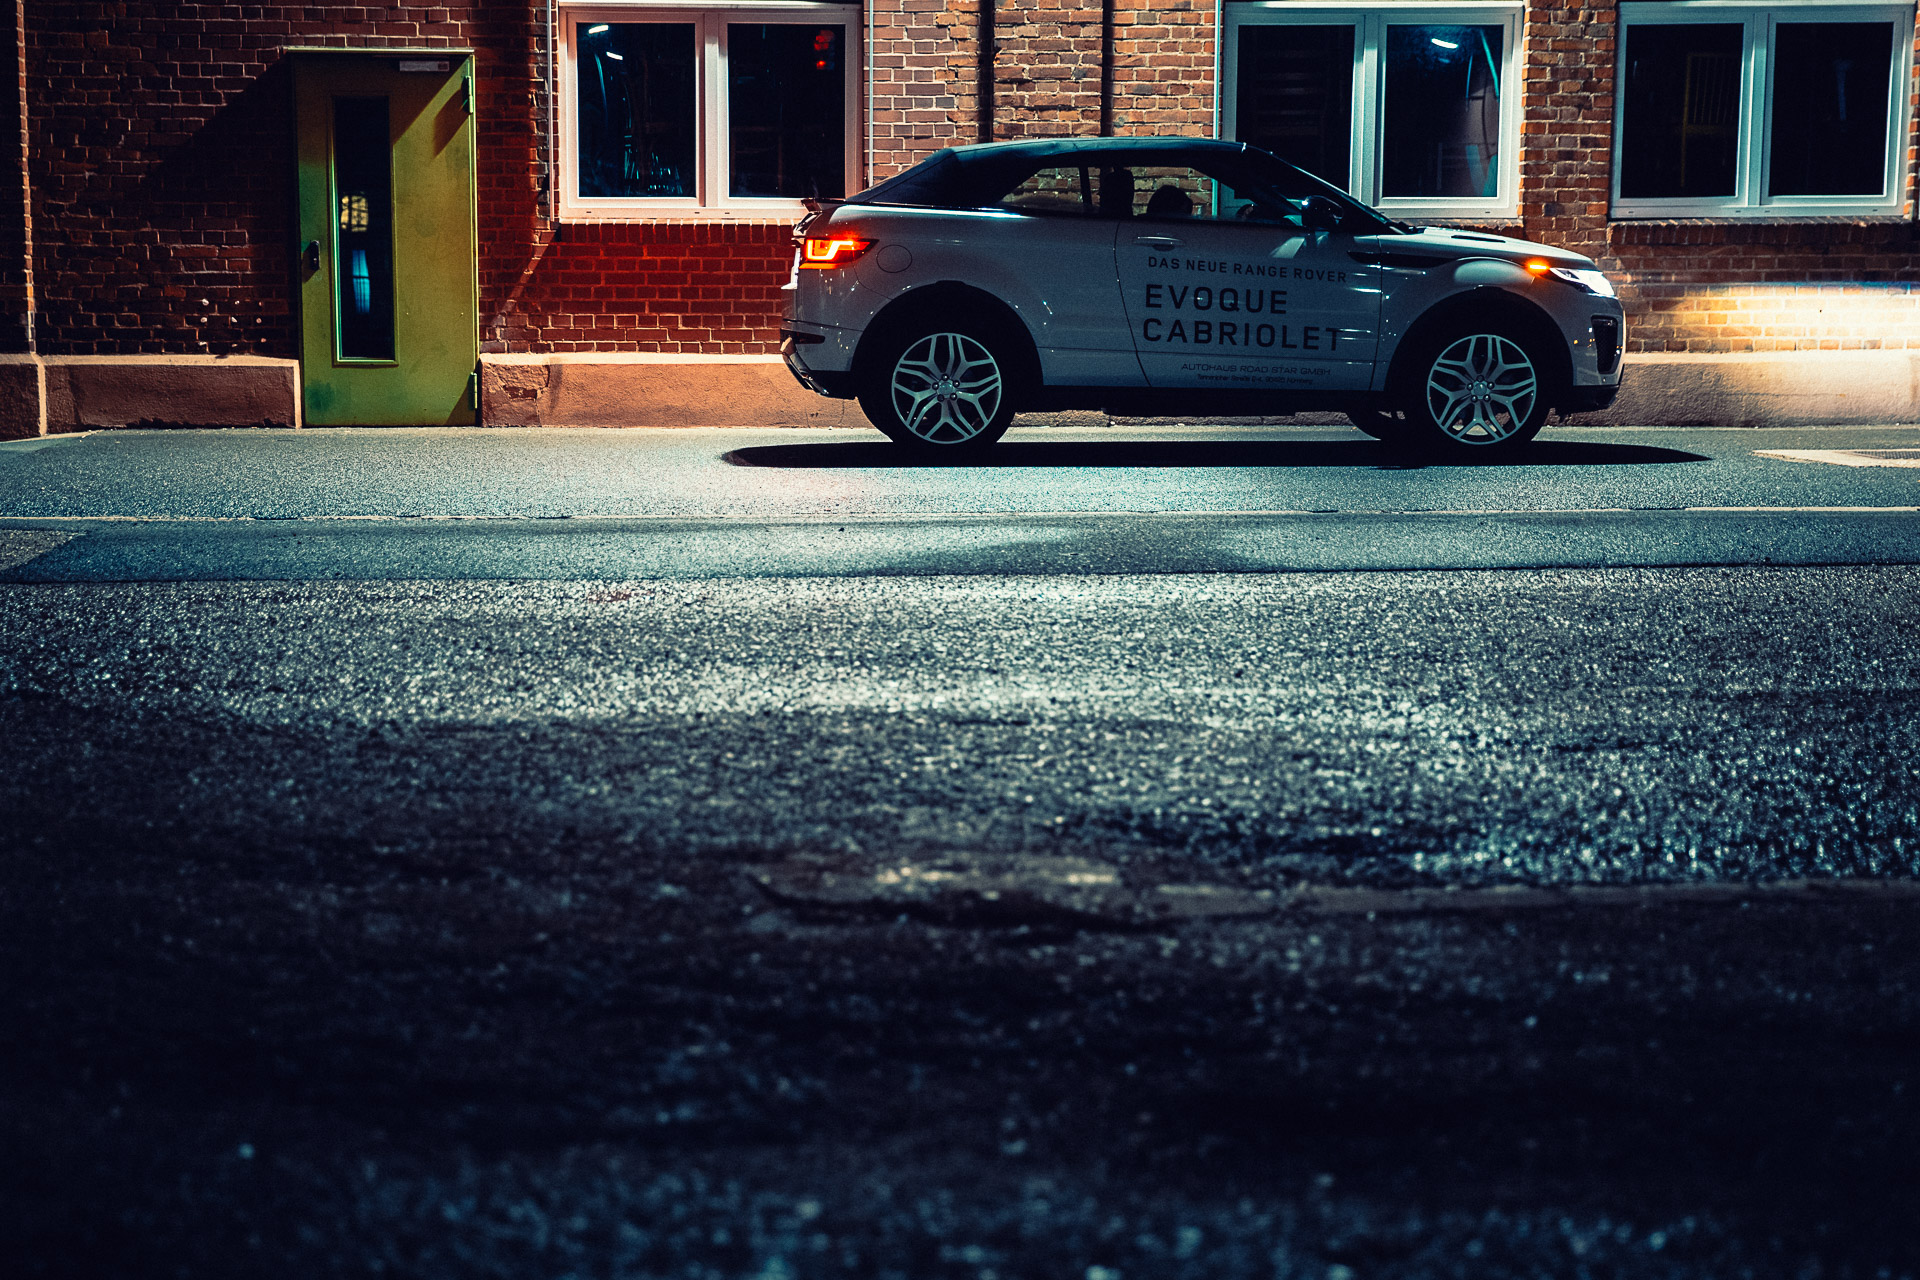 Range Rover Evoque Cabrio #1